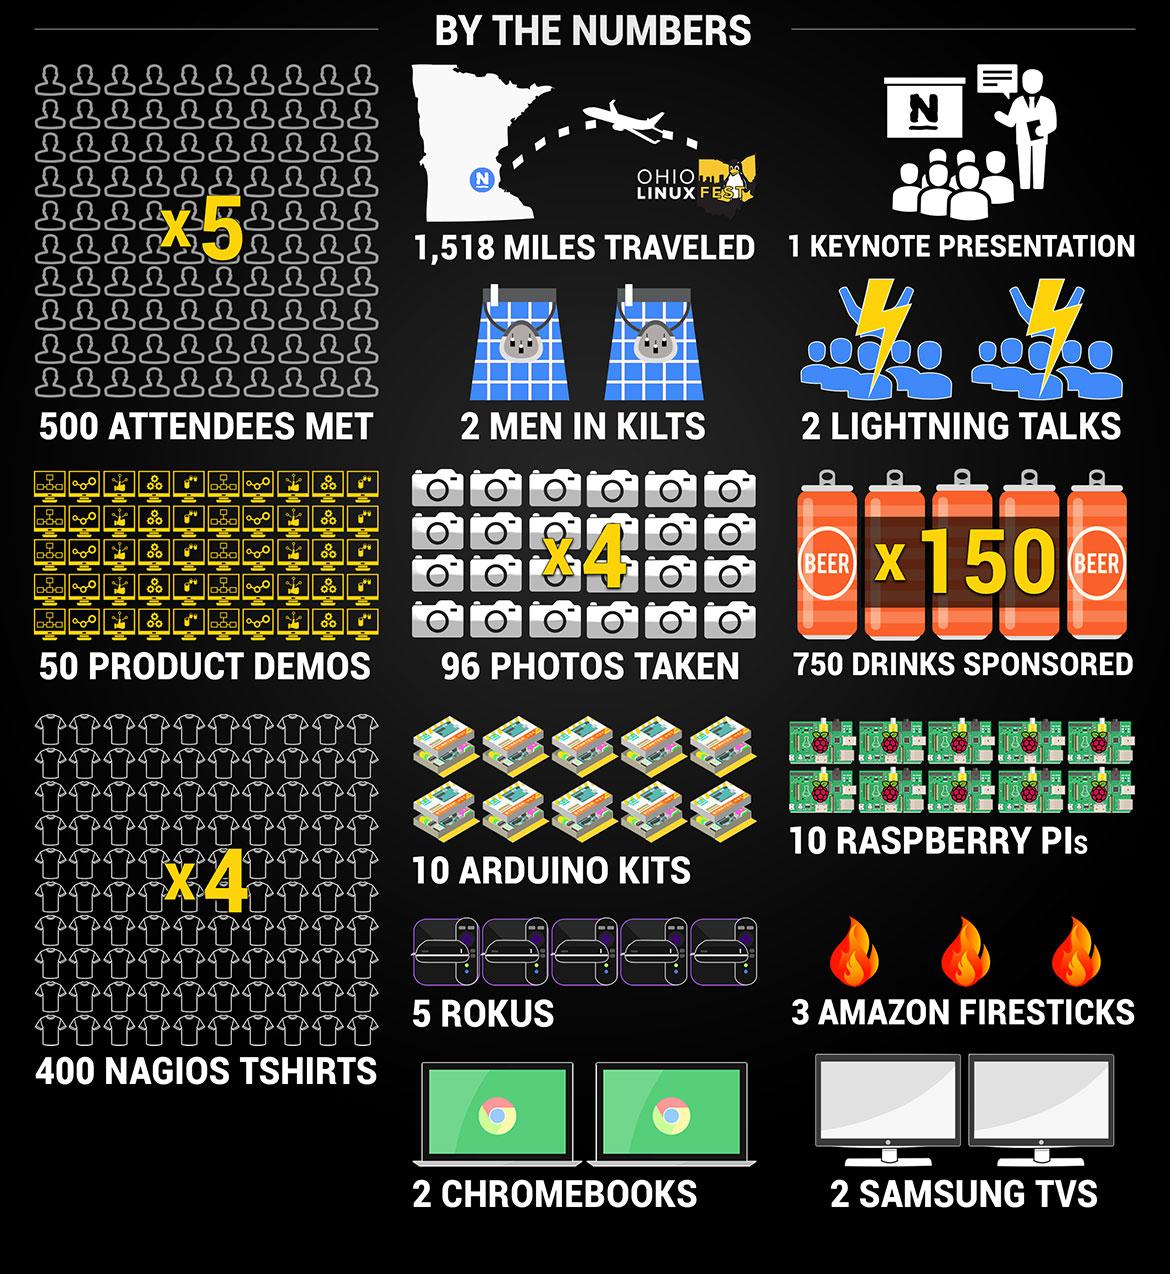 nagios-ohio-linuxfest-infographic-1